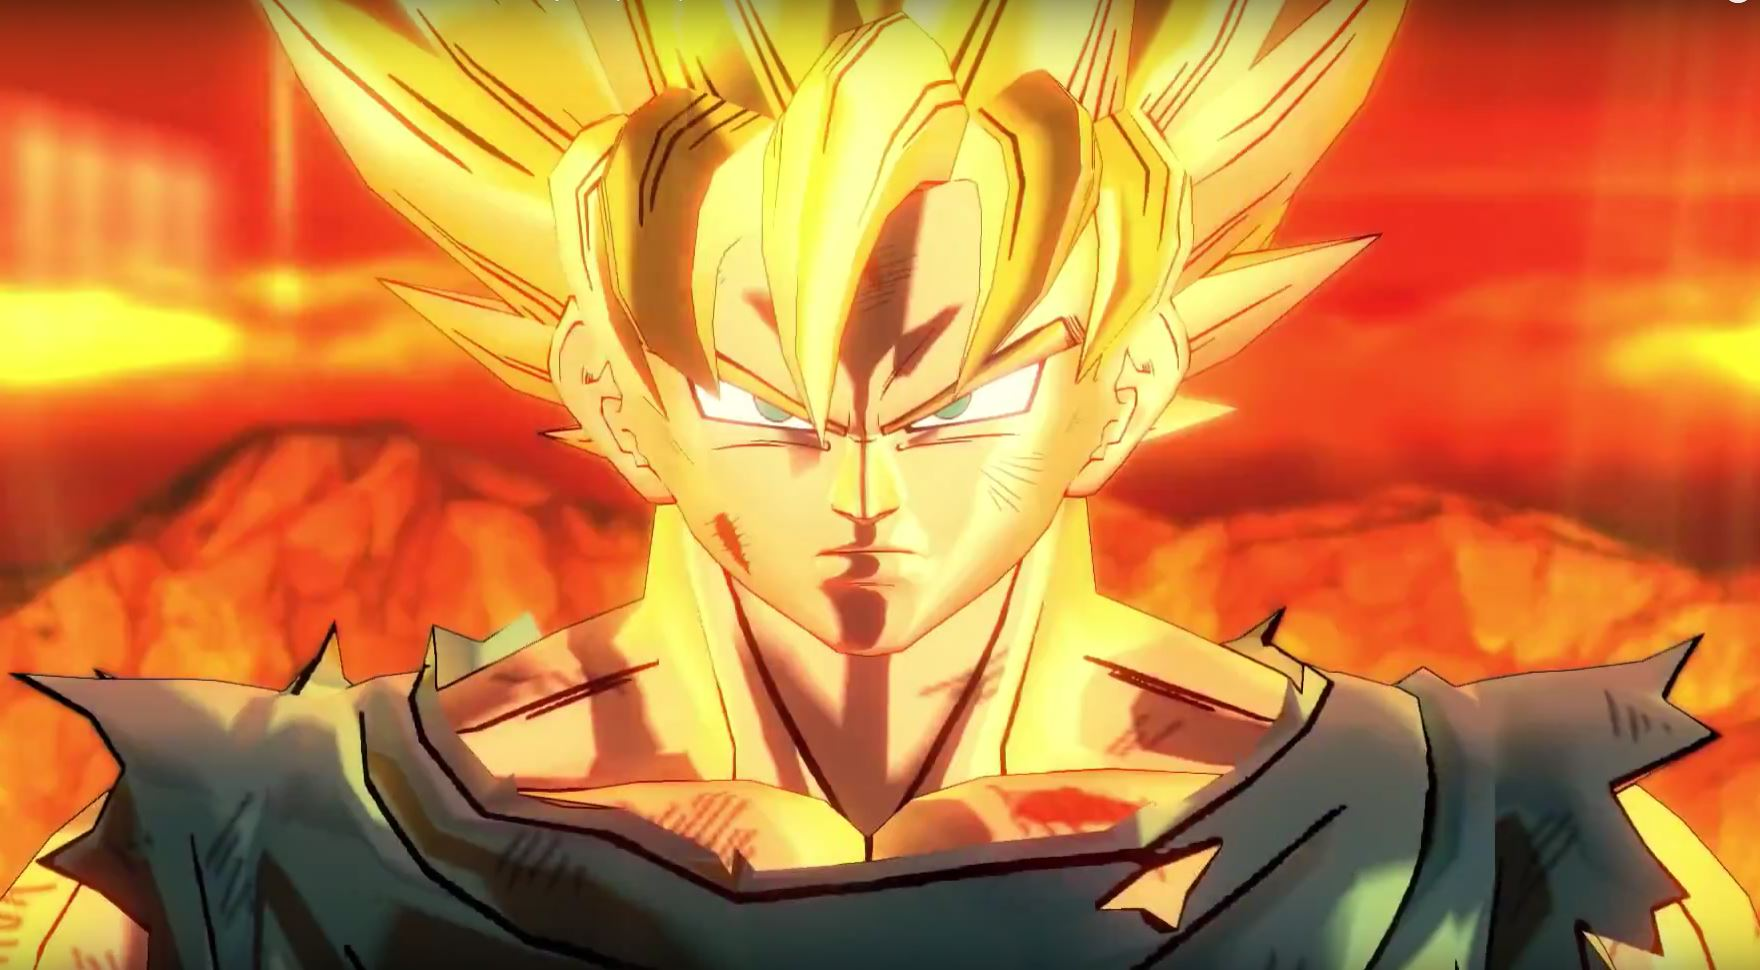 Tráiler de lanzamiento de Dragon Ball Xenoverse 2 ya disponible